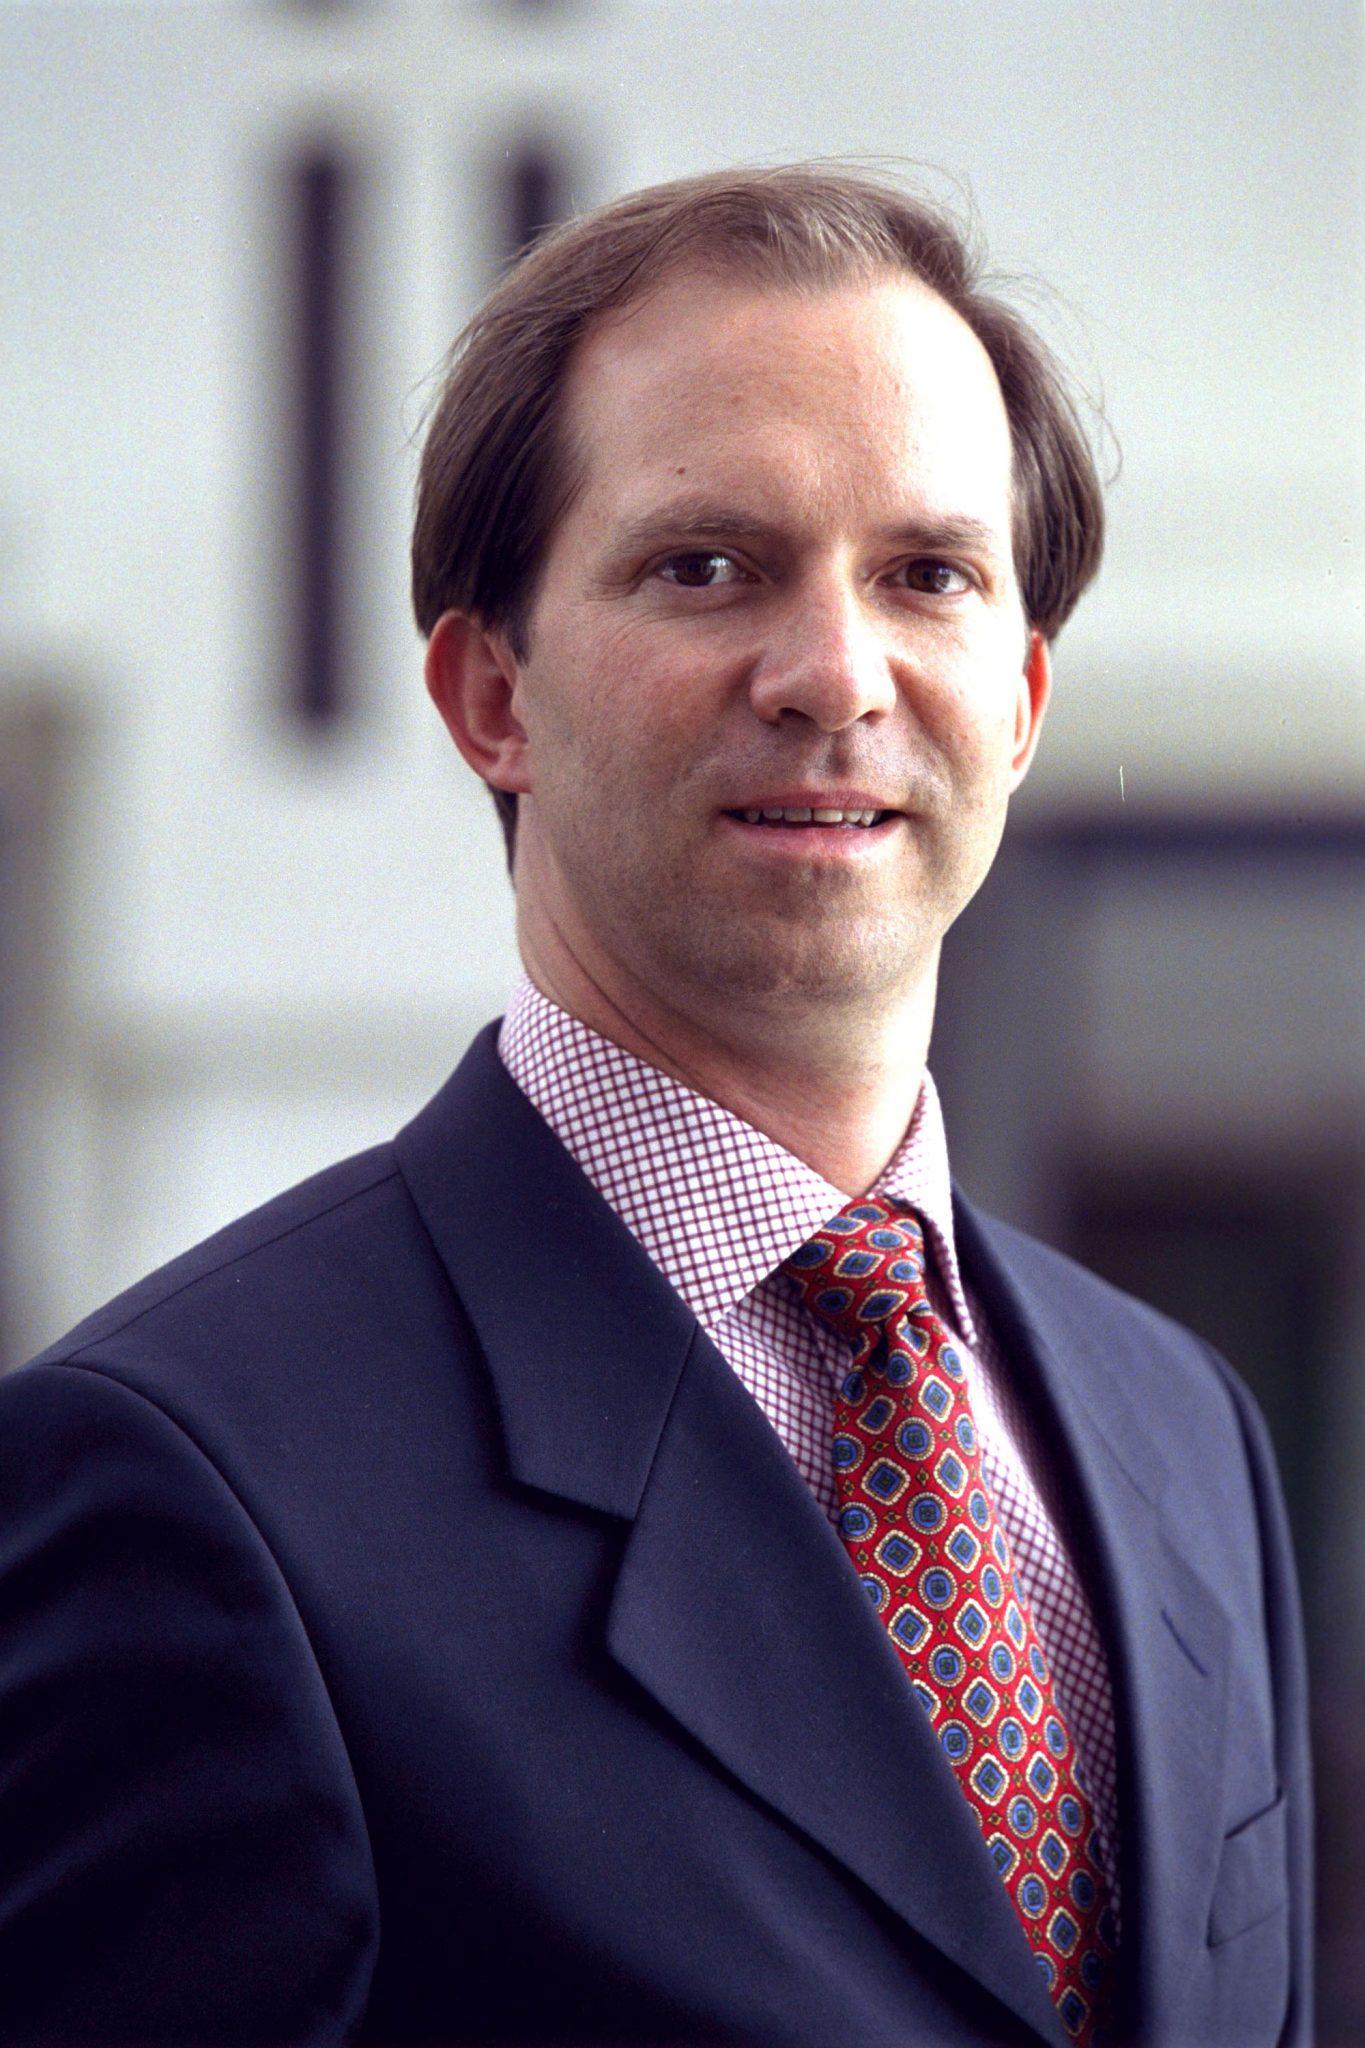 Wim Raymaekers, Swift